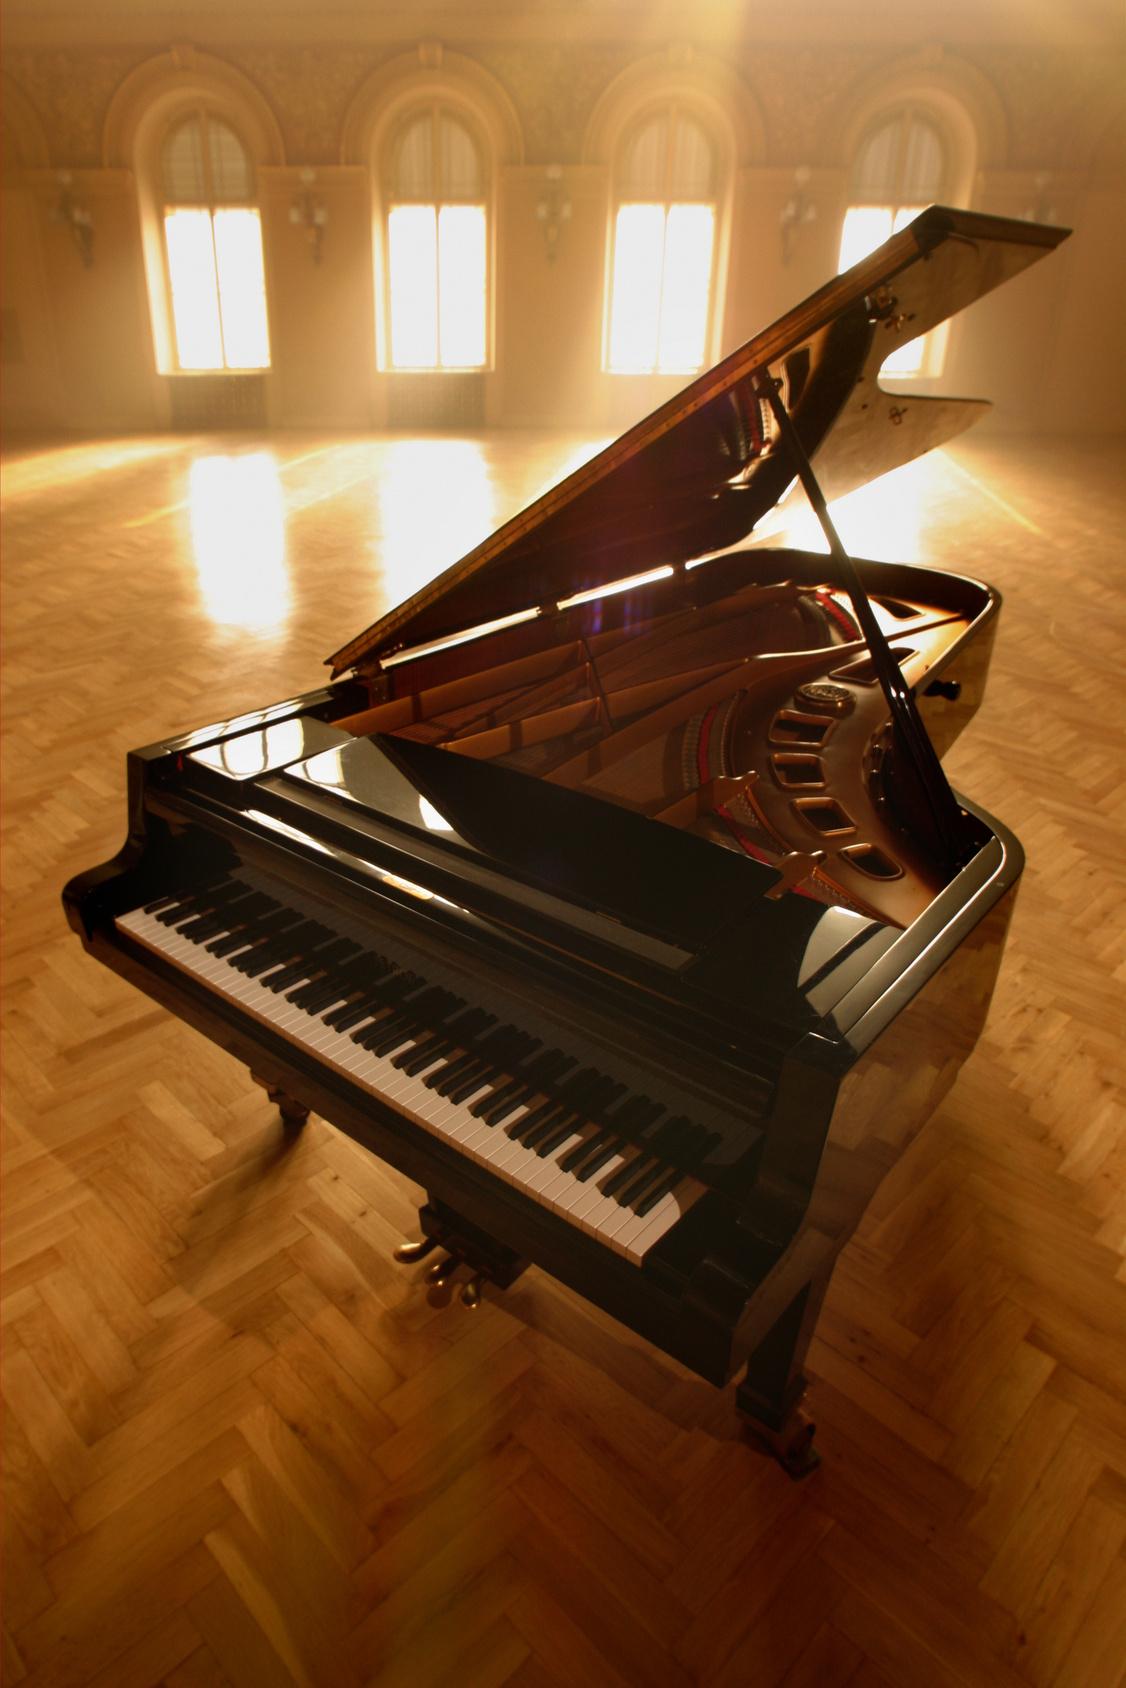 location de piano queue pour mariage aix en provence achat et location de piano avignon. Black Bedroom Furniture Sets. Home Design Ideas